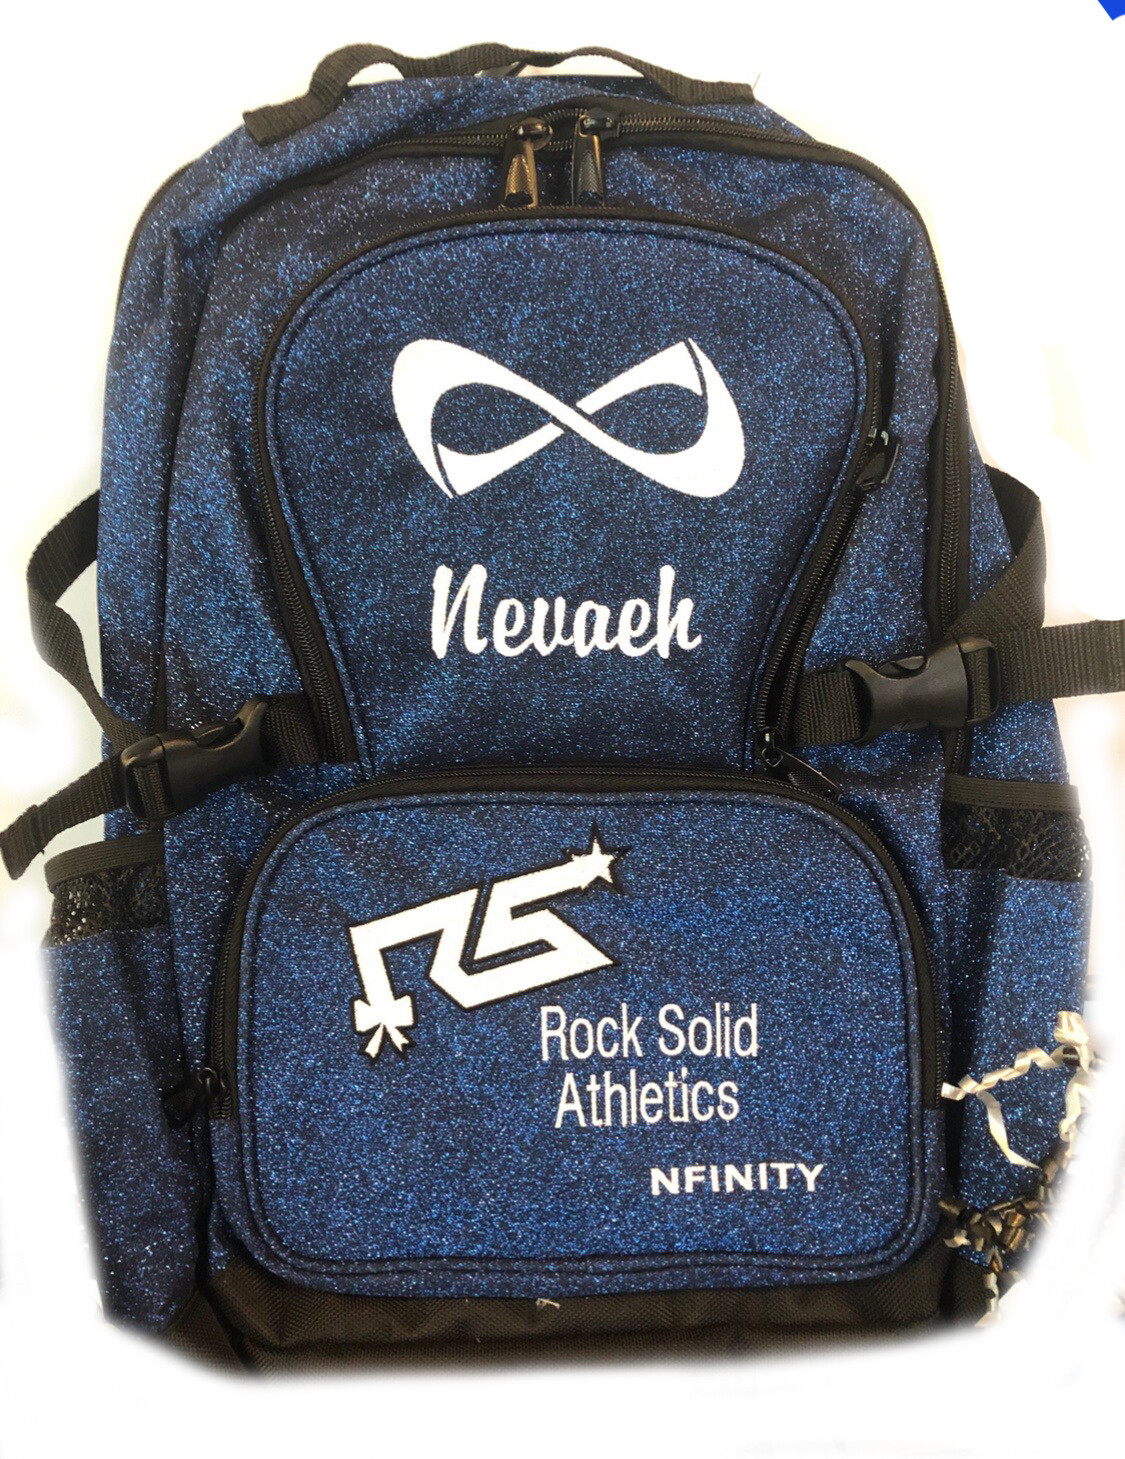 Nfinity Sparkle Backpack (Customized)